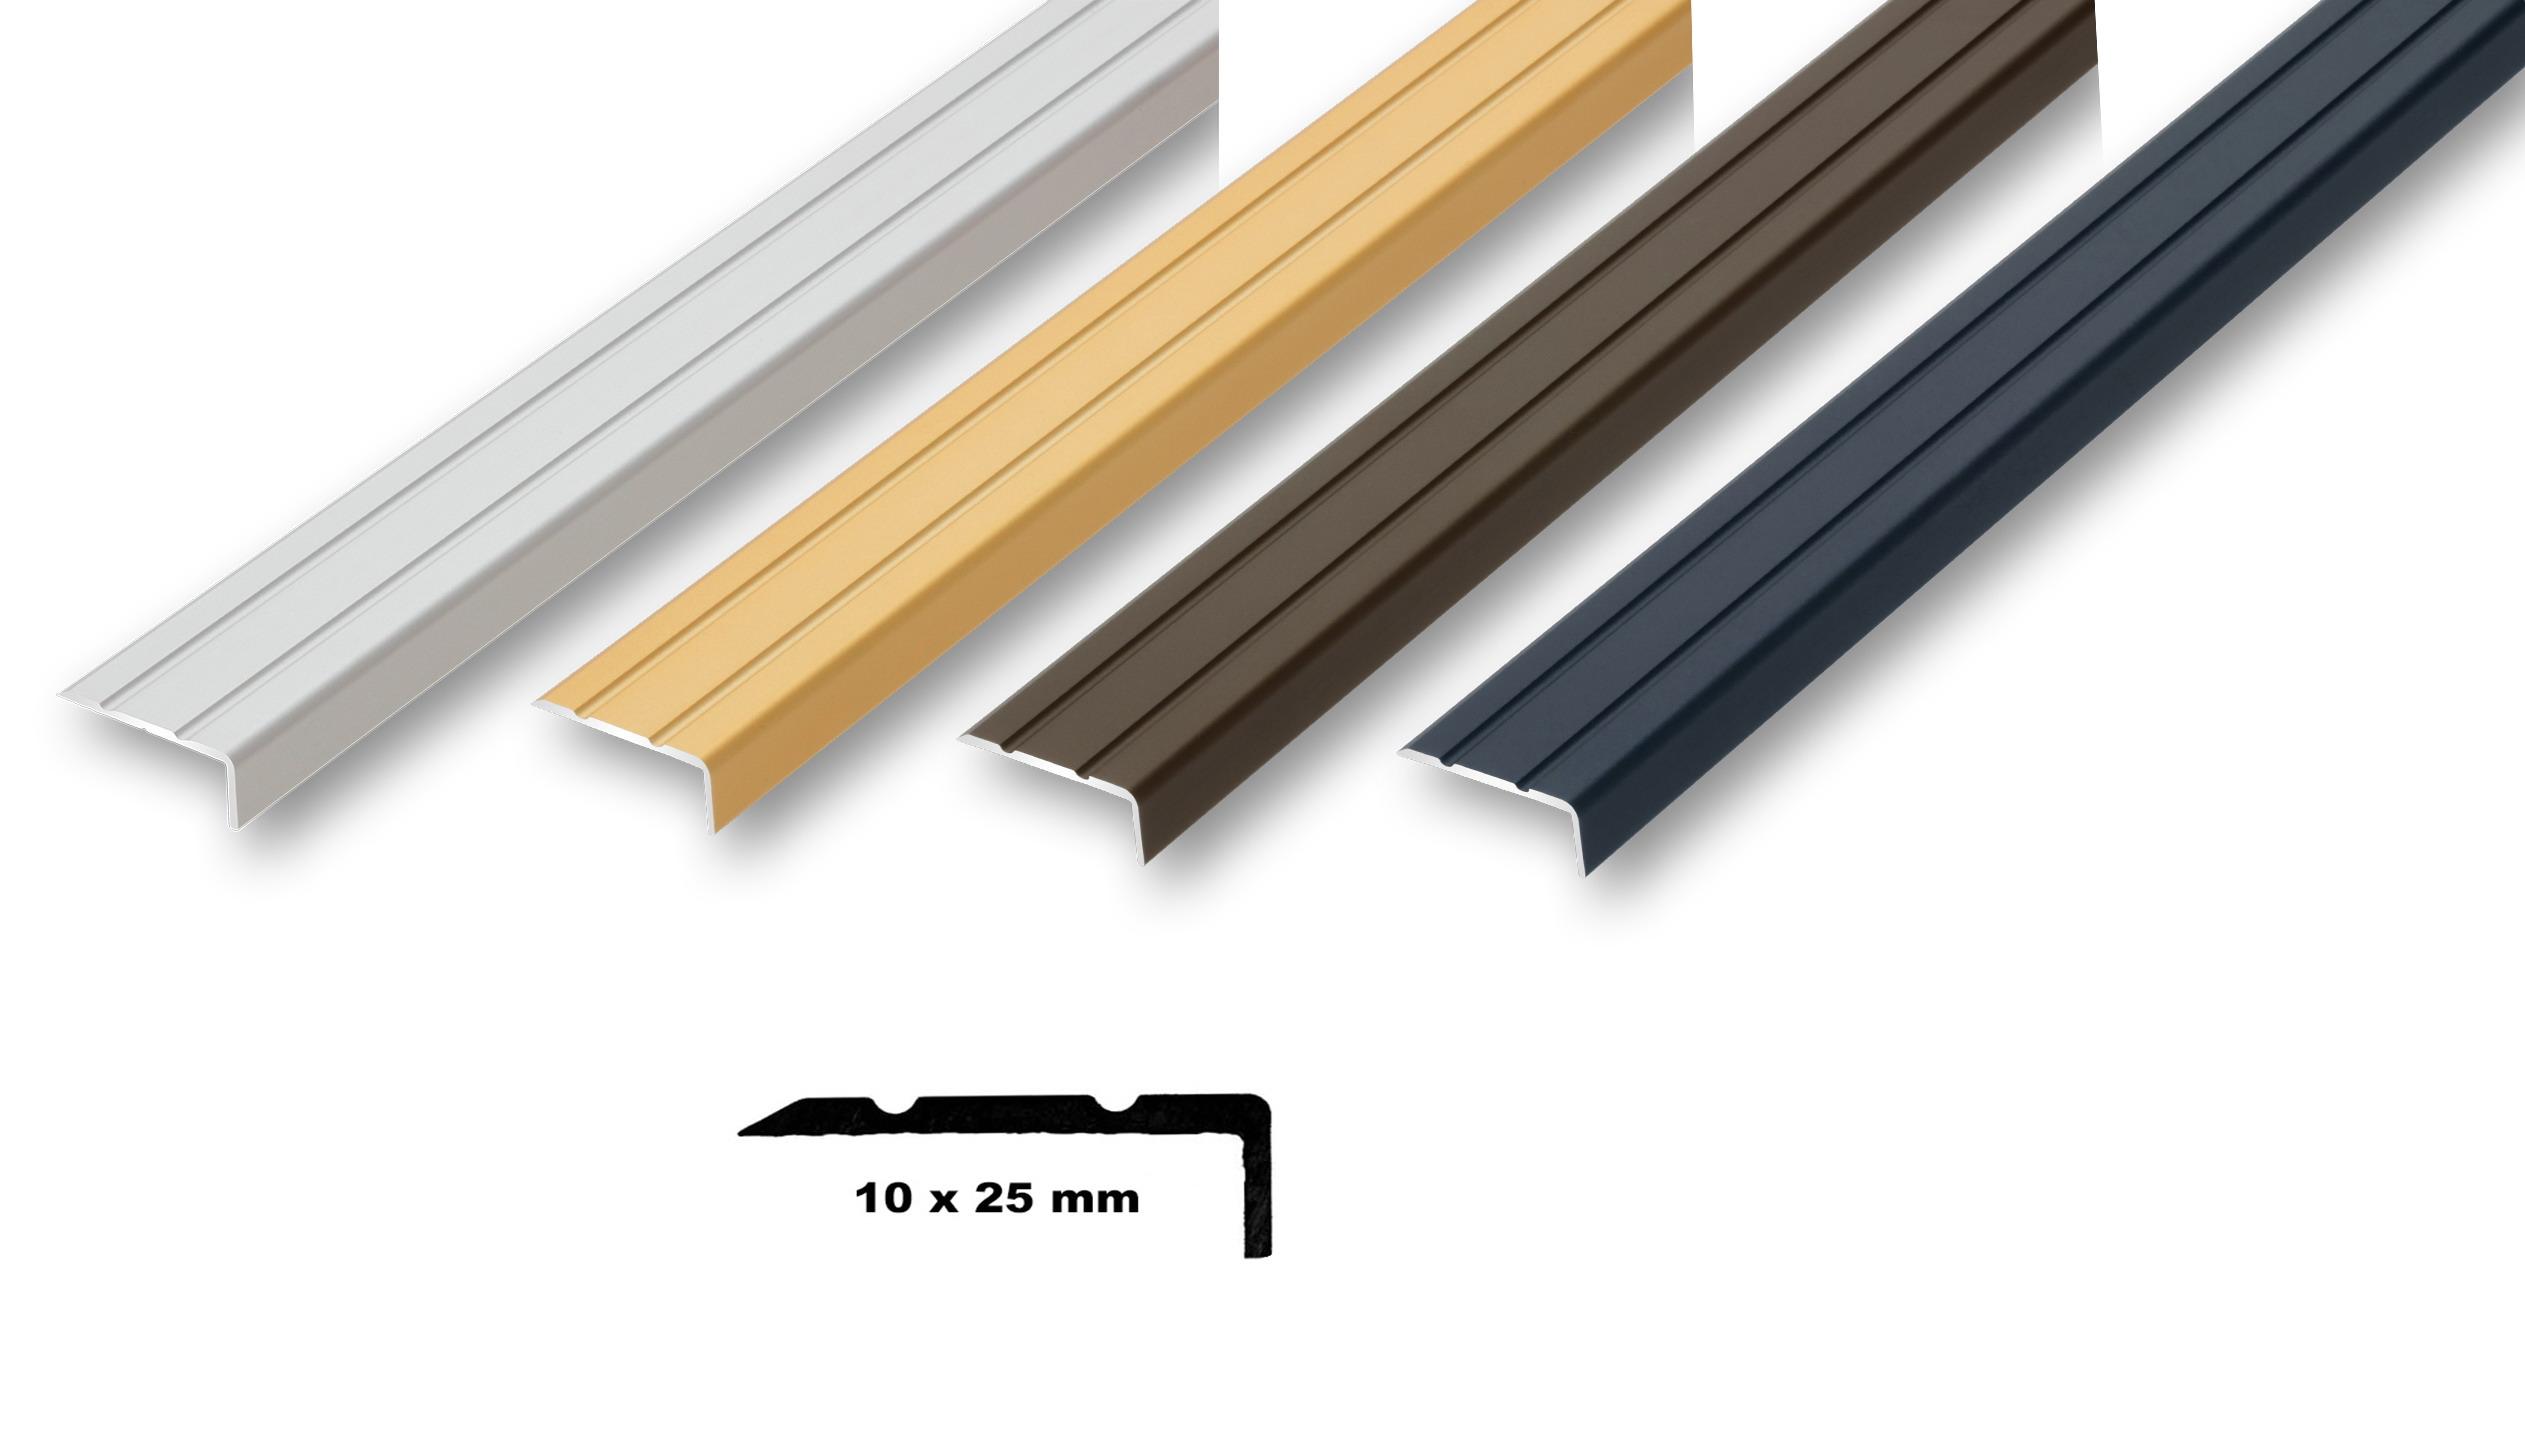 gebohrt ungebohrt , gold 30 x 32 x 1000 mm Treppenkantenprofil Treppenwinkel 30 x 32 x 1000 mm 6 Farben Kantenschutz ungebohrt-selbstklebend selbstklebend Kantenwinkel |